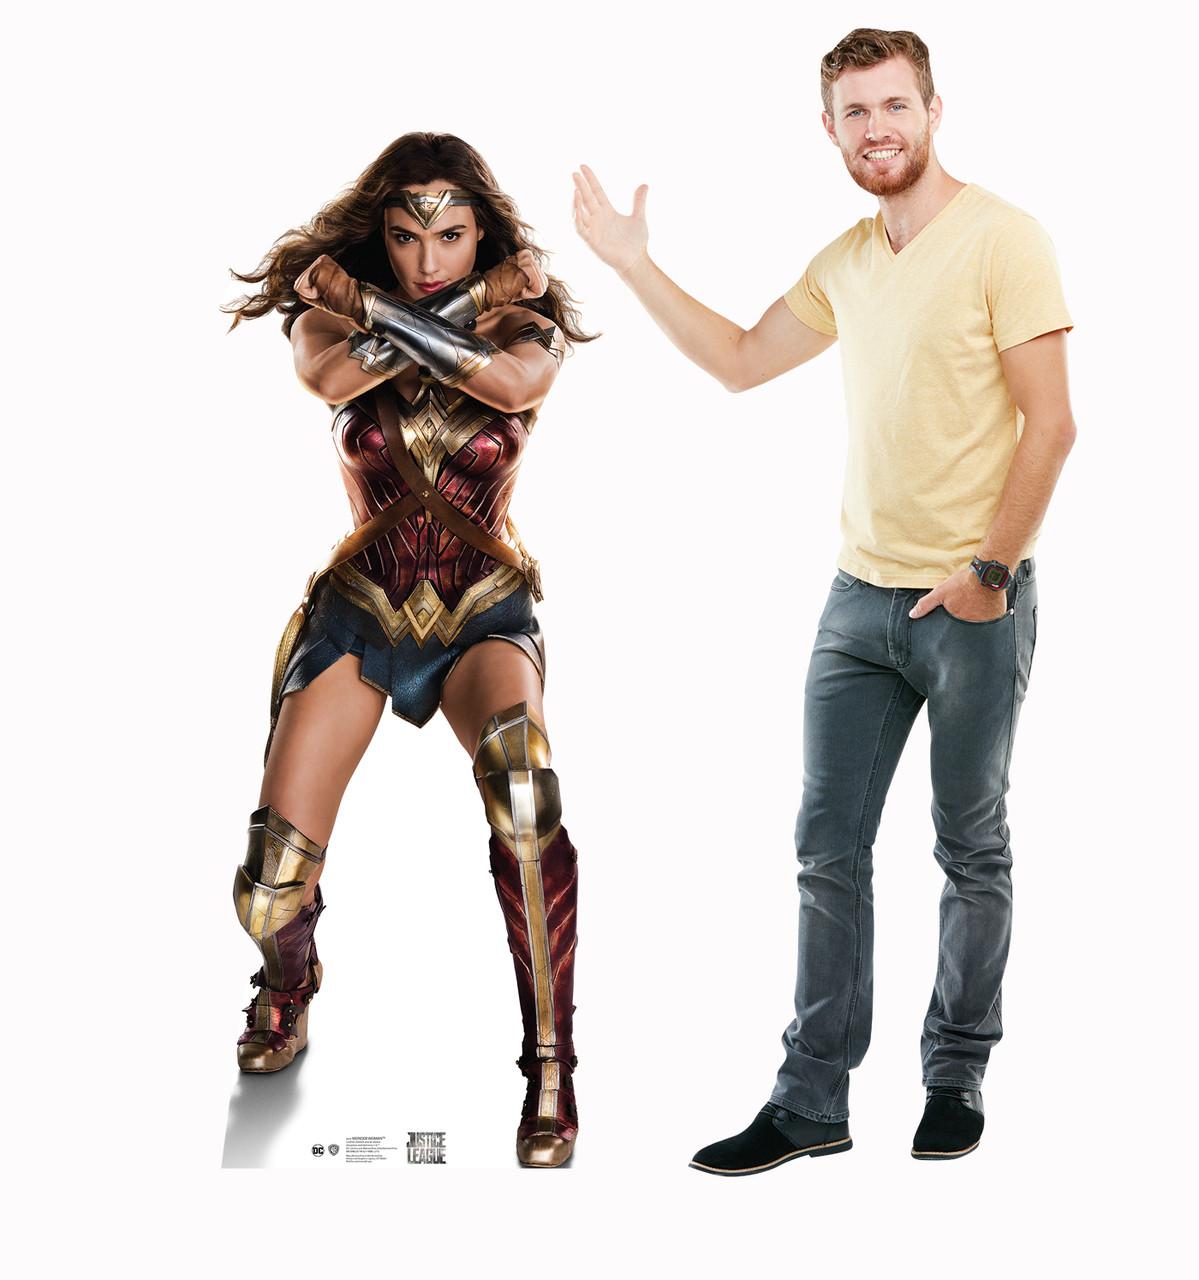 Wonder Woman (Justice League) Cardboard Cutout-lifesize